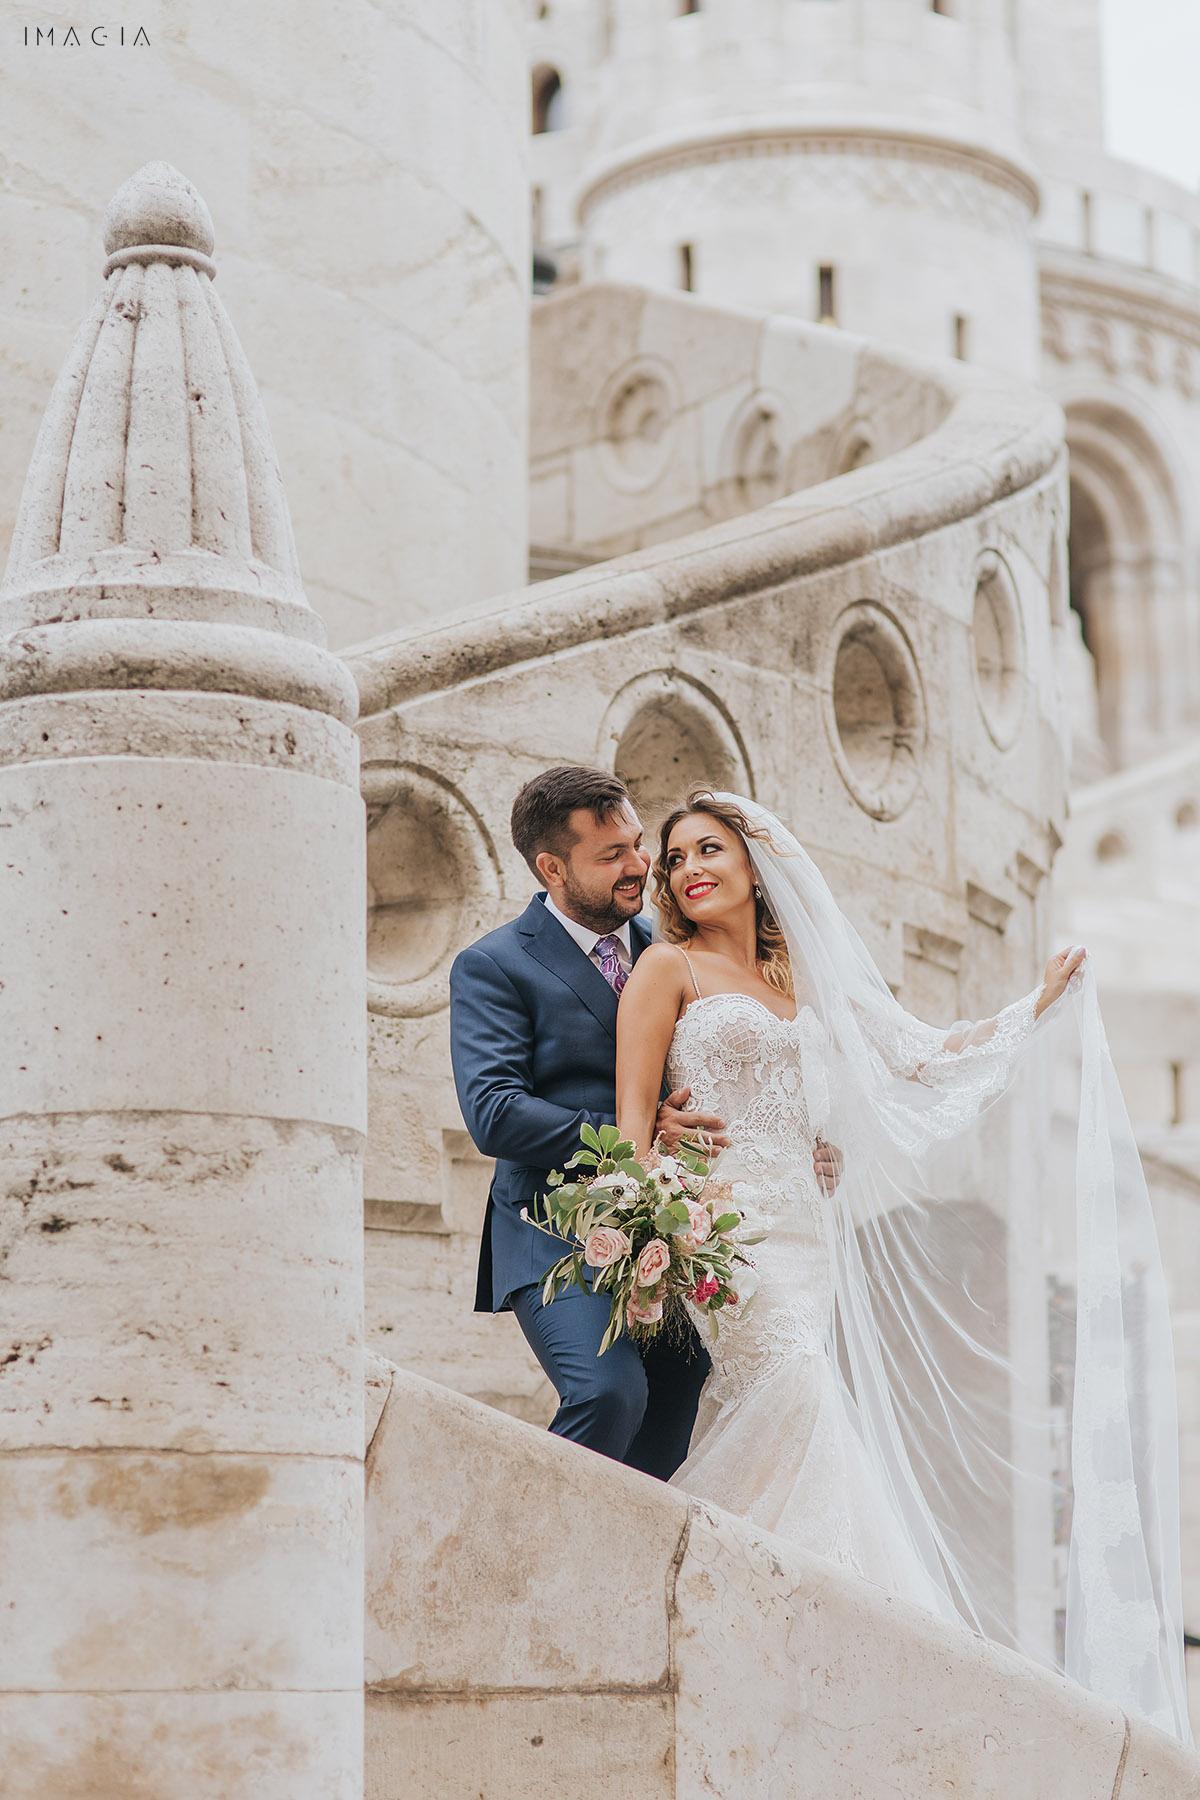 Sedinta foto dupa nunta in Budapesta